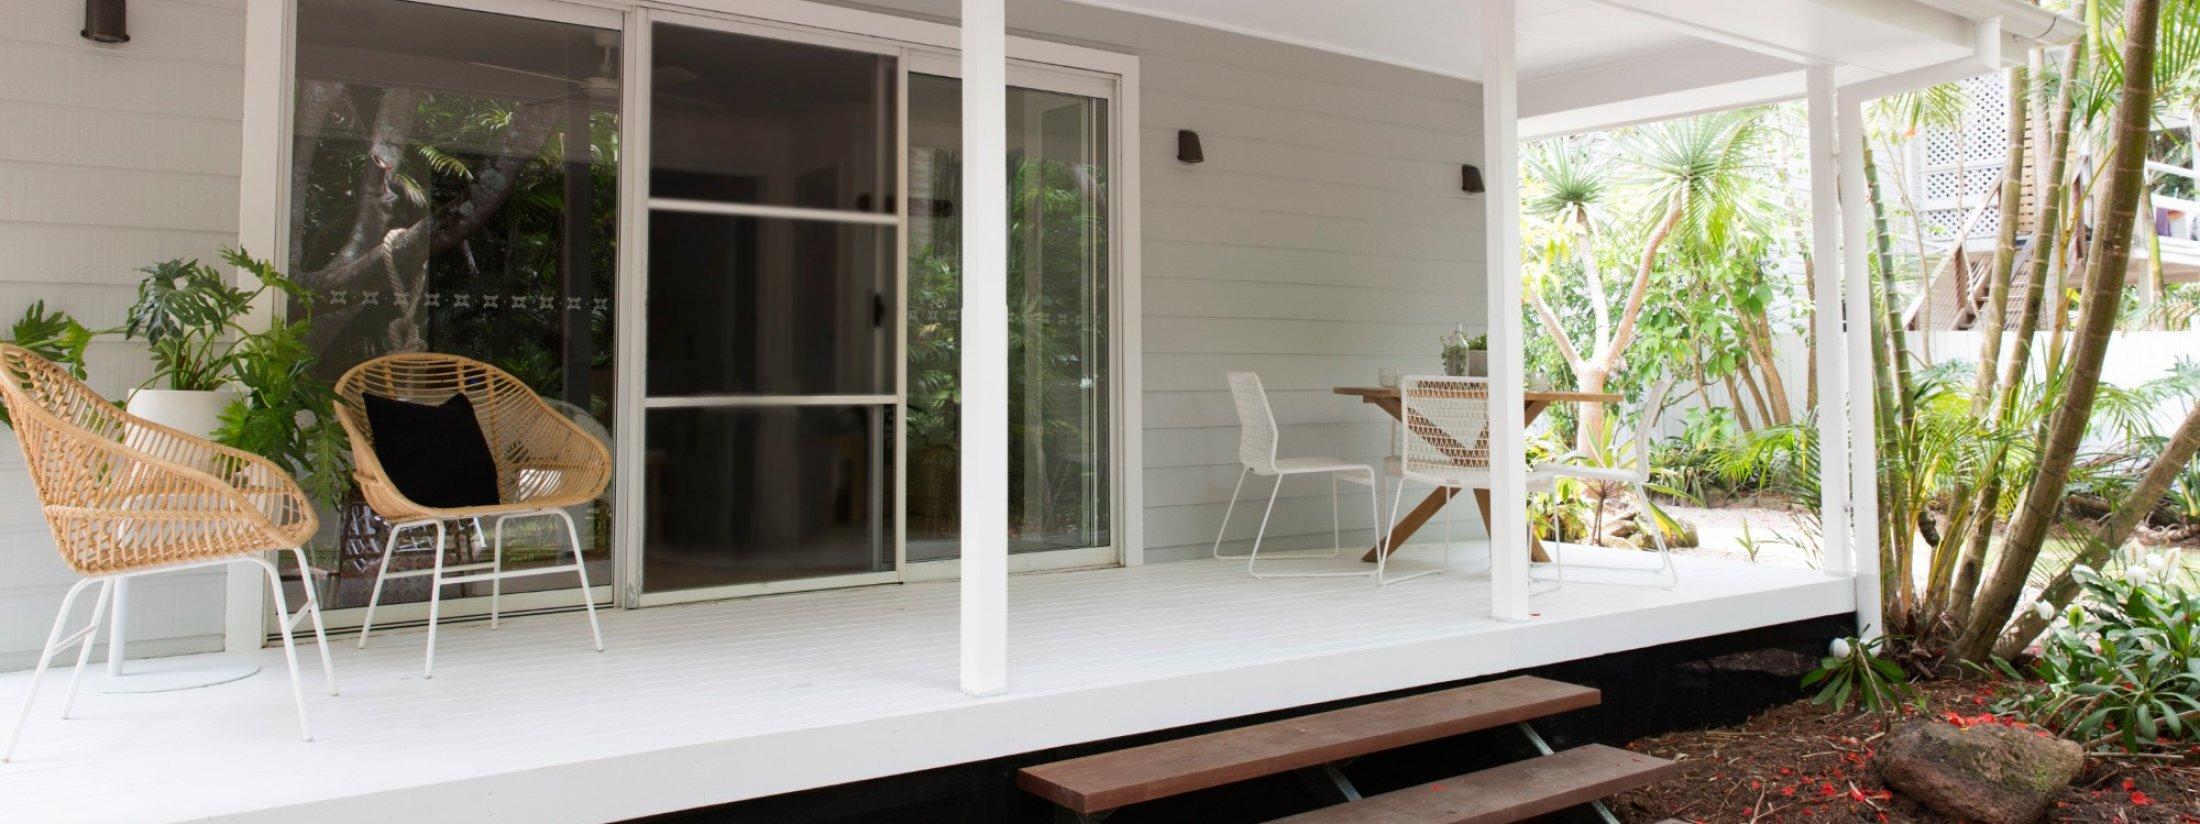 Barrel and Branch - Byron Bay - studio bedroom entrance